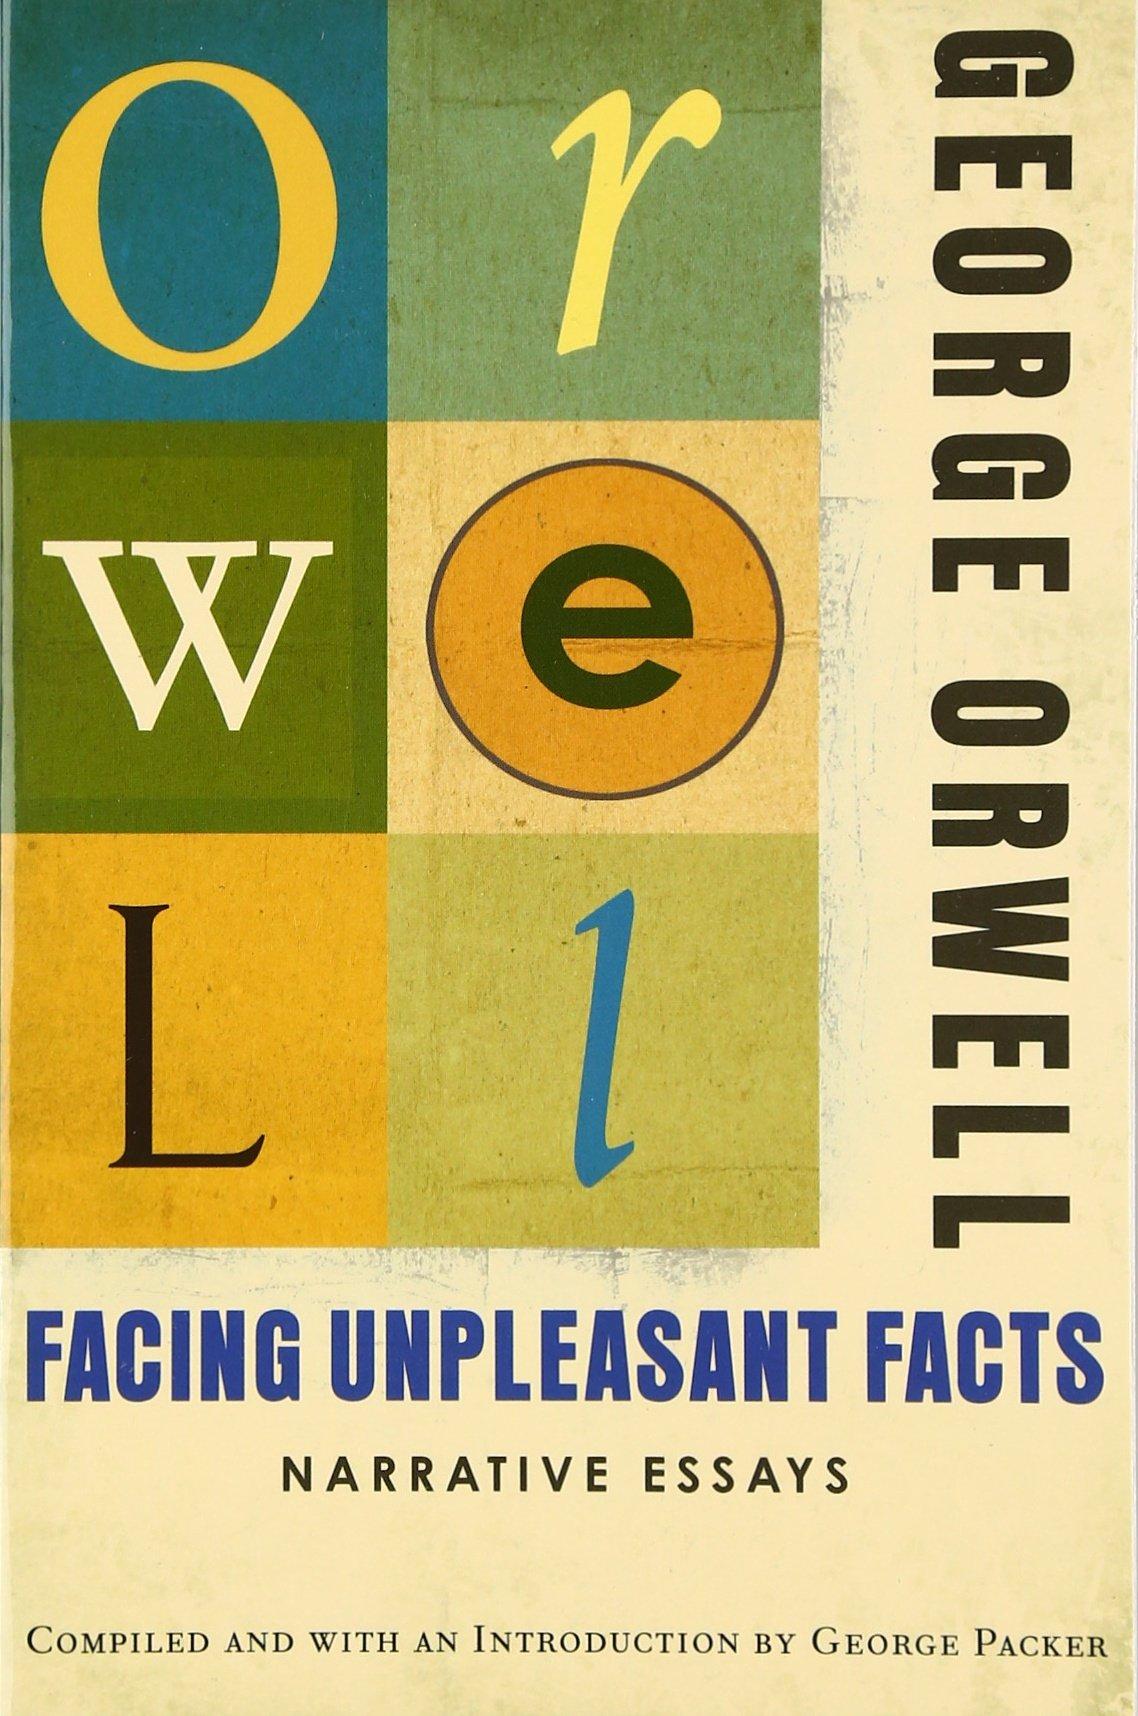 023 Essay Example 817mi1ypesl George Orwell Frightening Essays Everyman's Library Summary Bookshop Memories Full